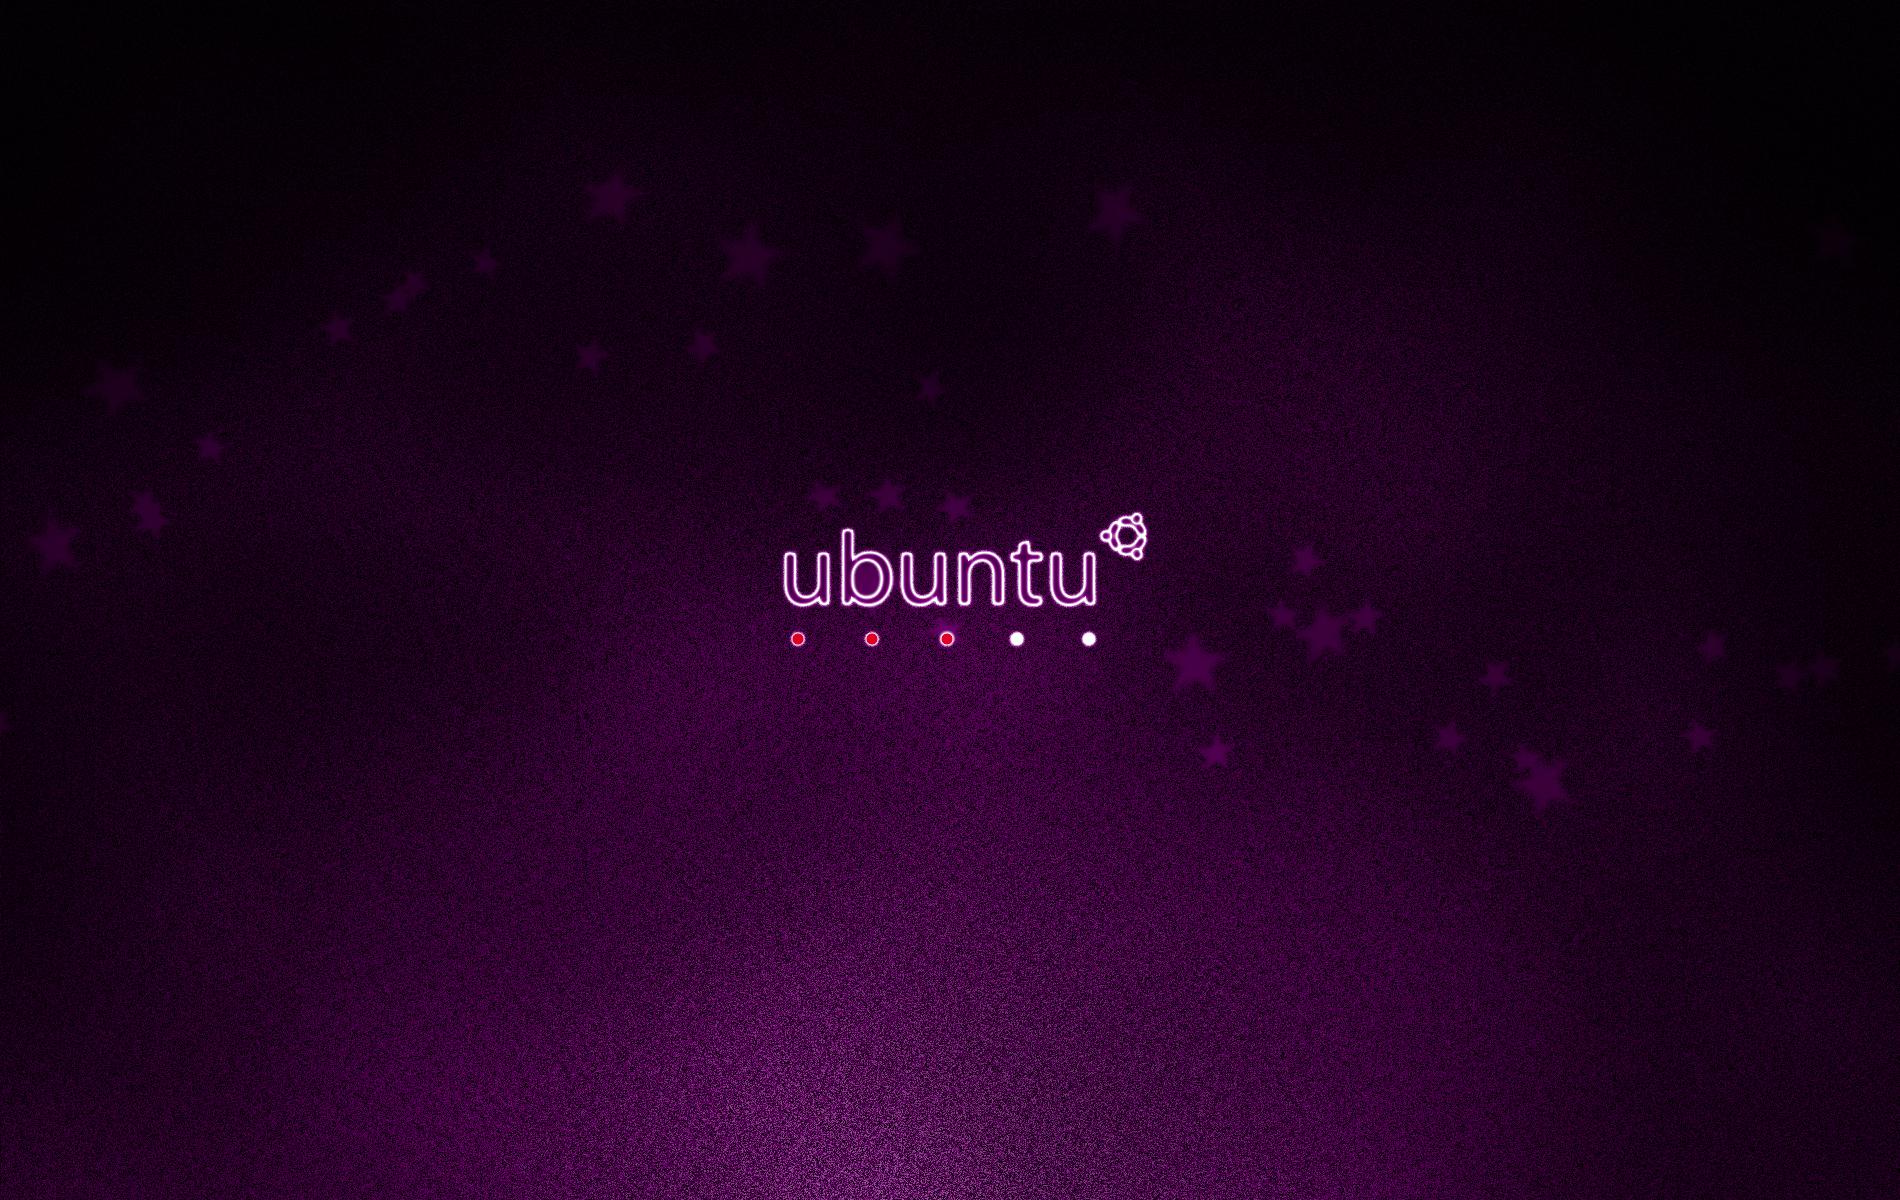 Wallpapers   Ubuntu Minimal Wallpaper Dark Version wallpaper 1900x1200